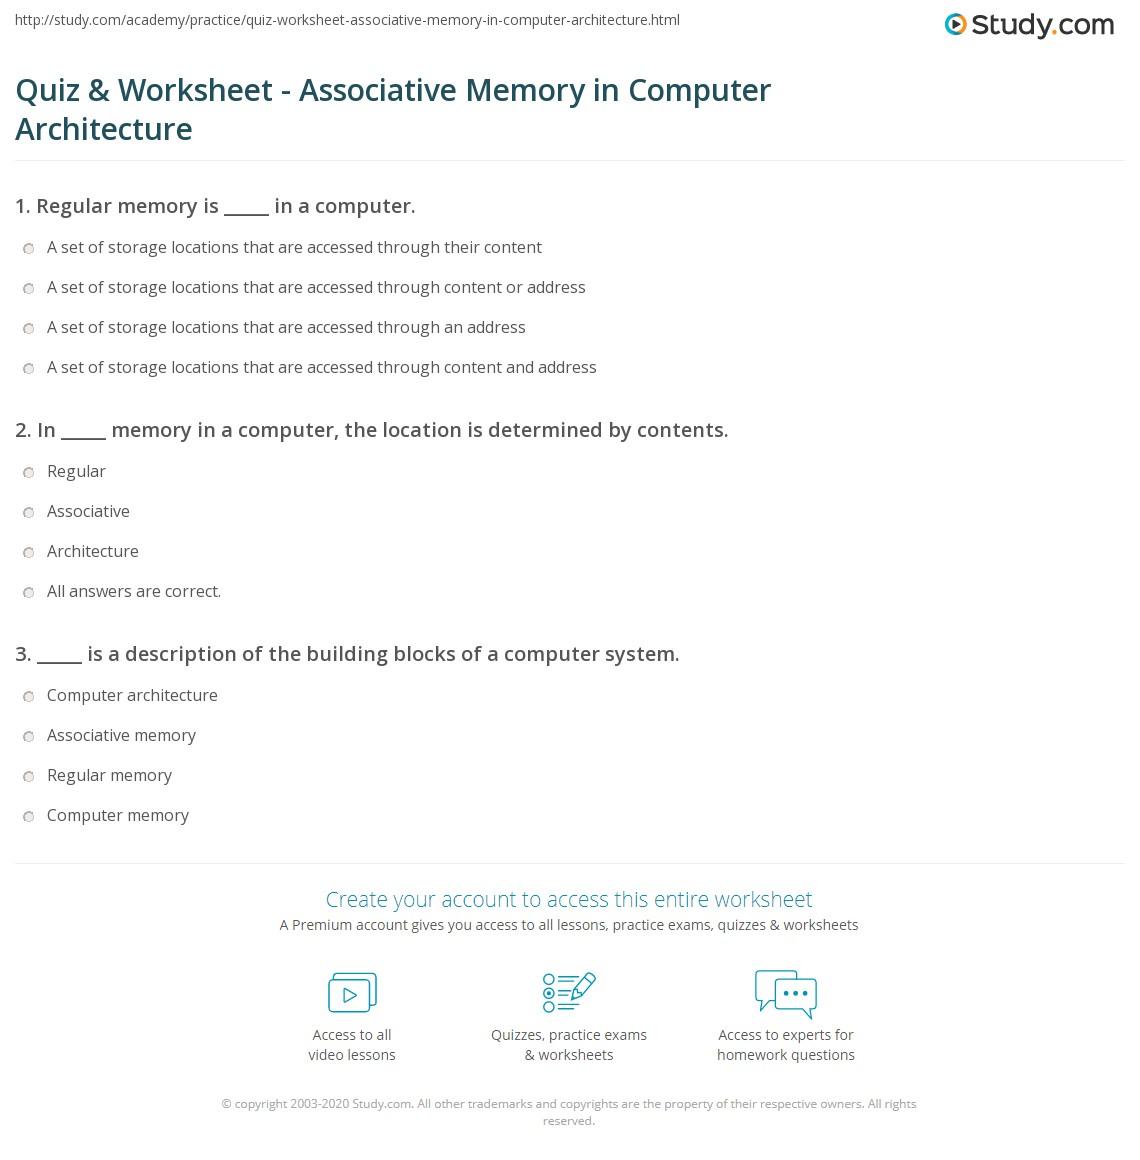 worksheet Computer Memory Worksheet quiz worksheet associative memory in computer architecture print worksheet